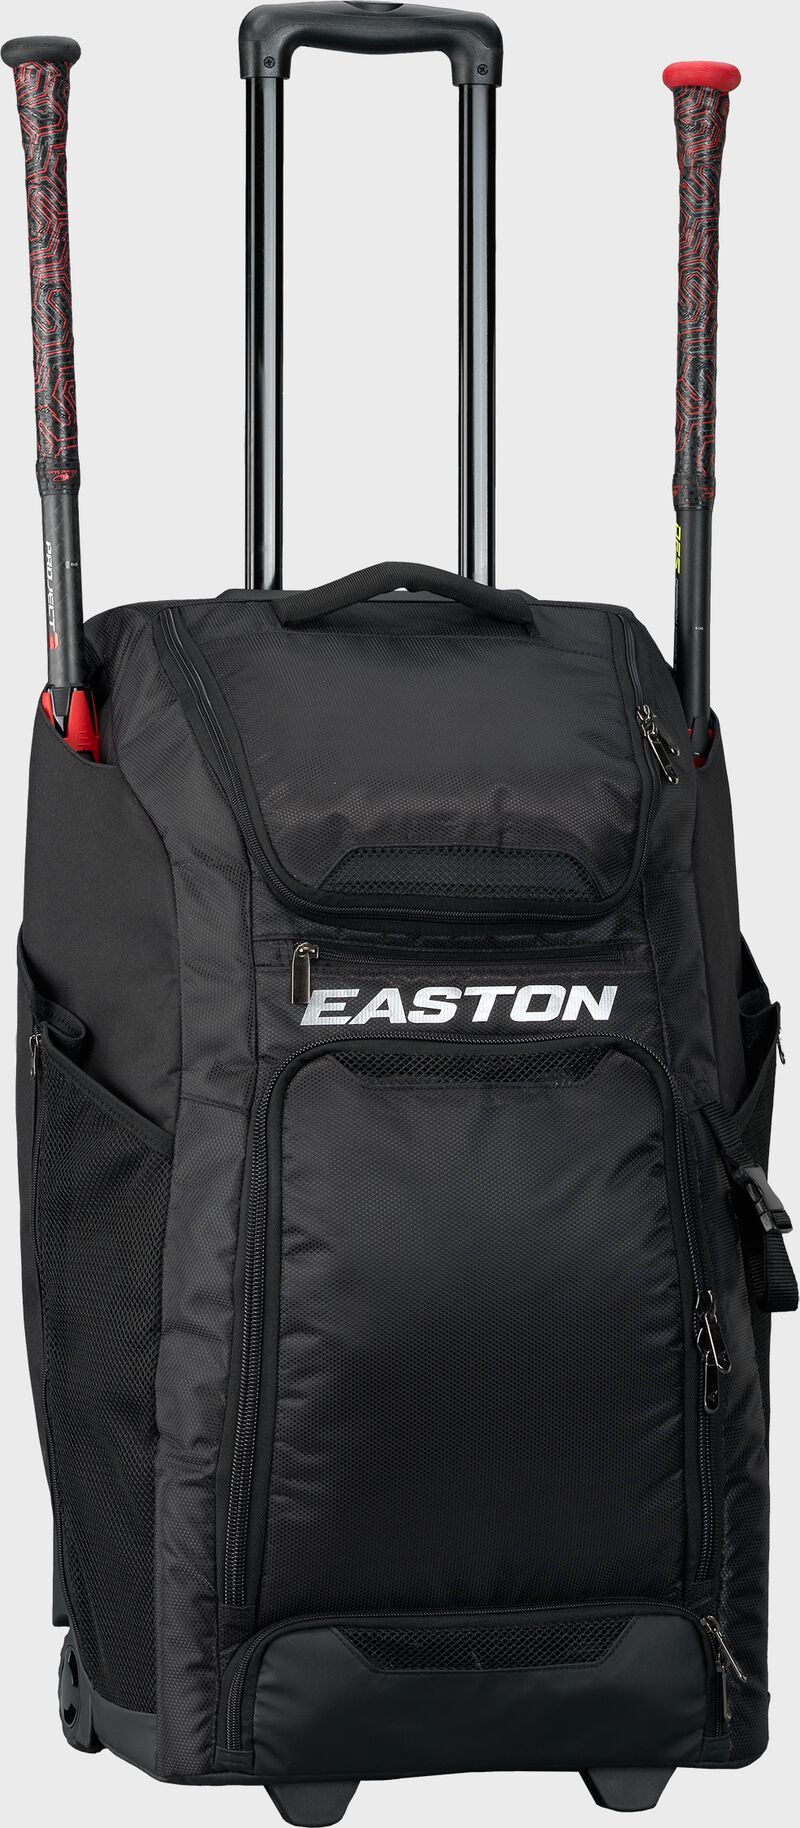 Catcher's Wheeled Bag